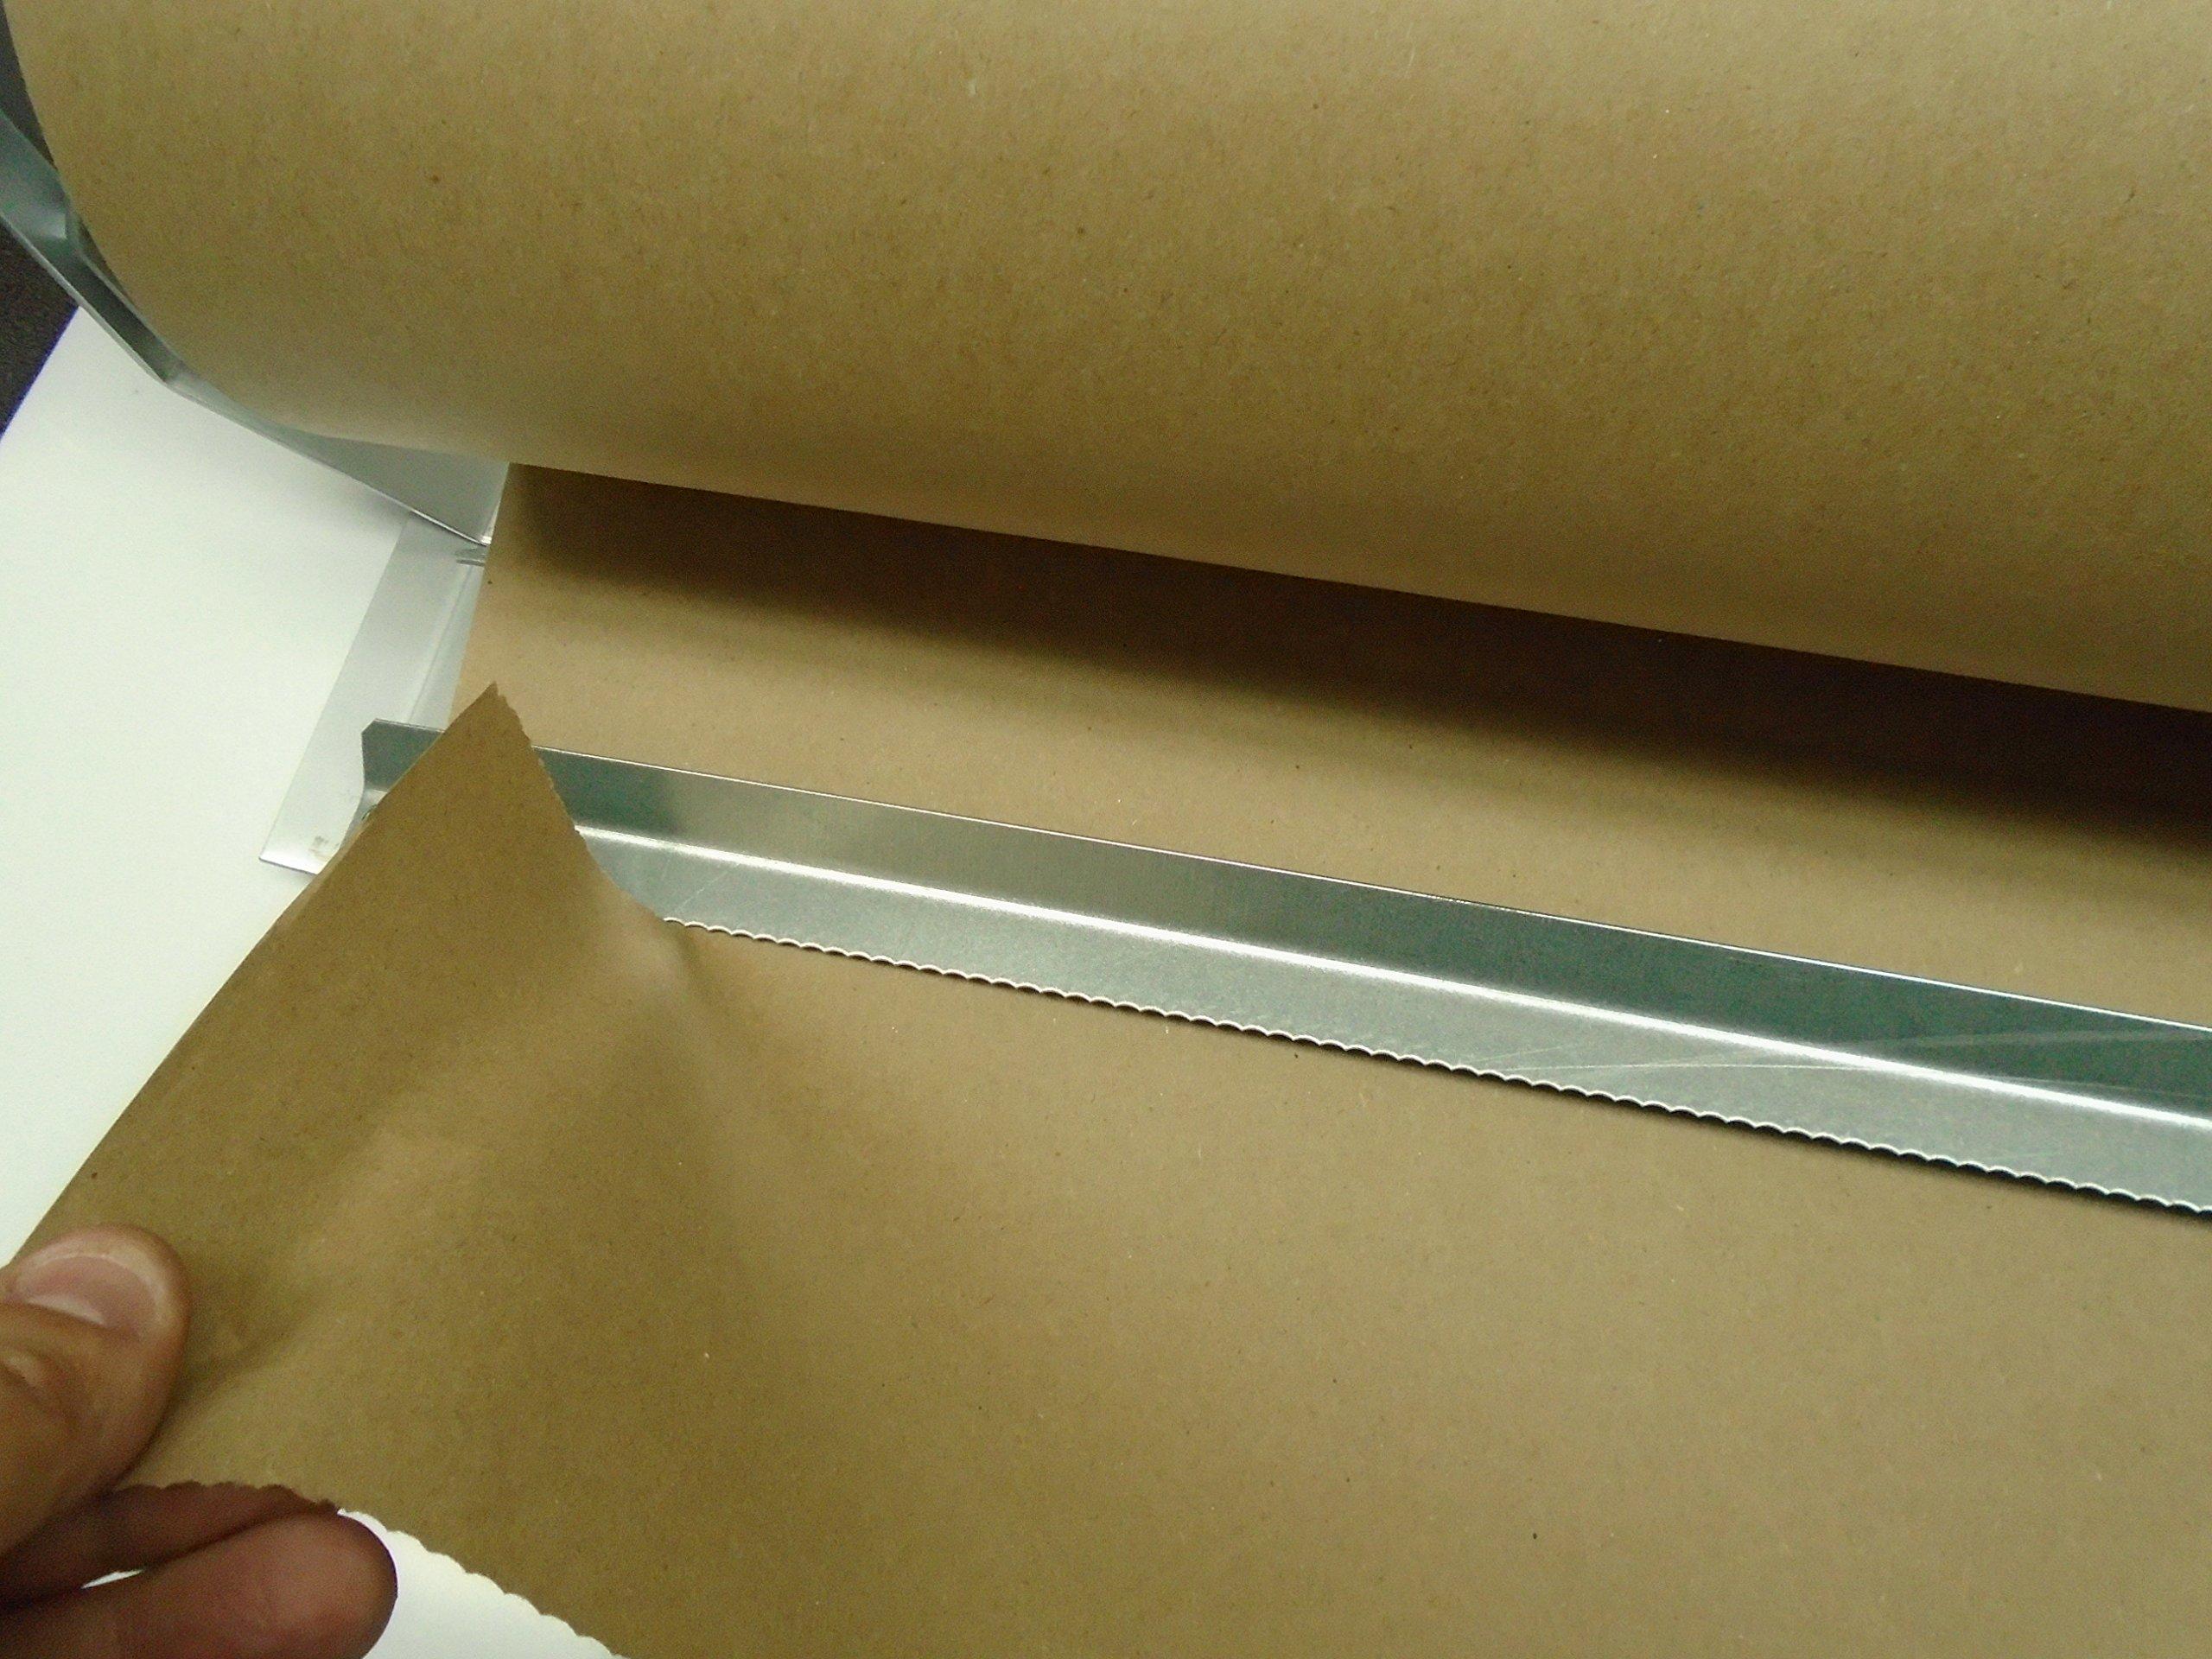 Paper Cutter Roll Dispenser Econoline 60 inches table mount Kraft paper Duralov by Duralov (Image #8)